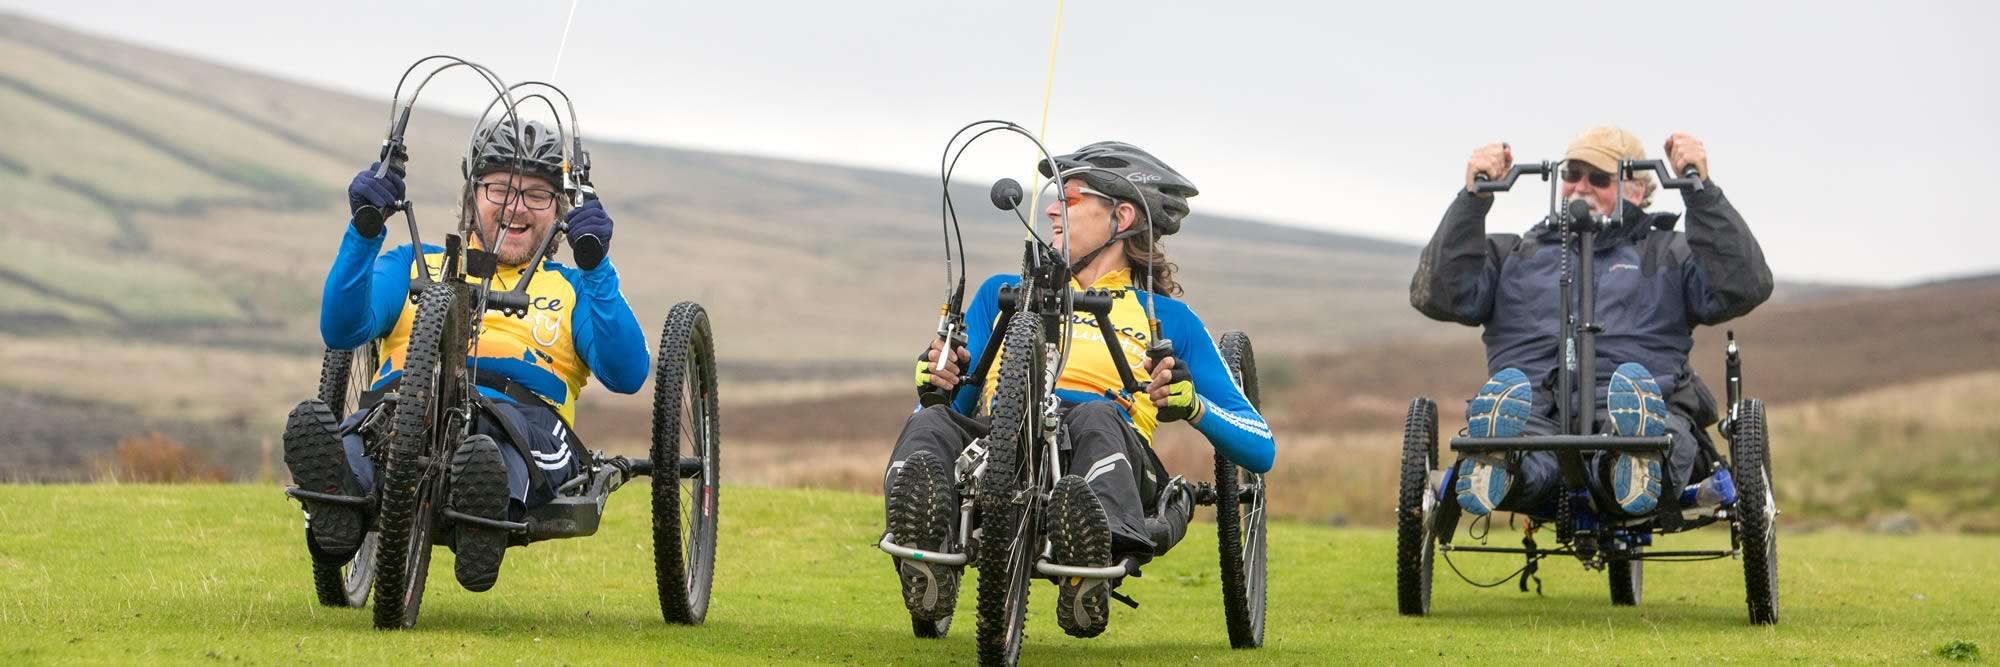 Three visitors on all-terrain hand bikes